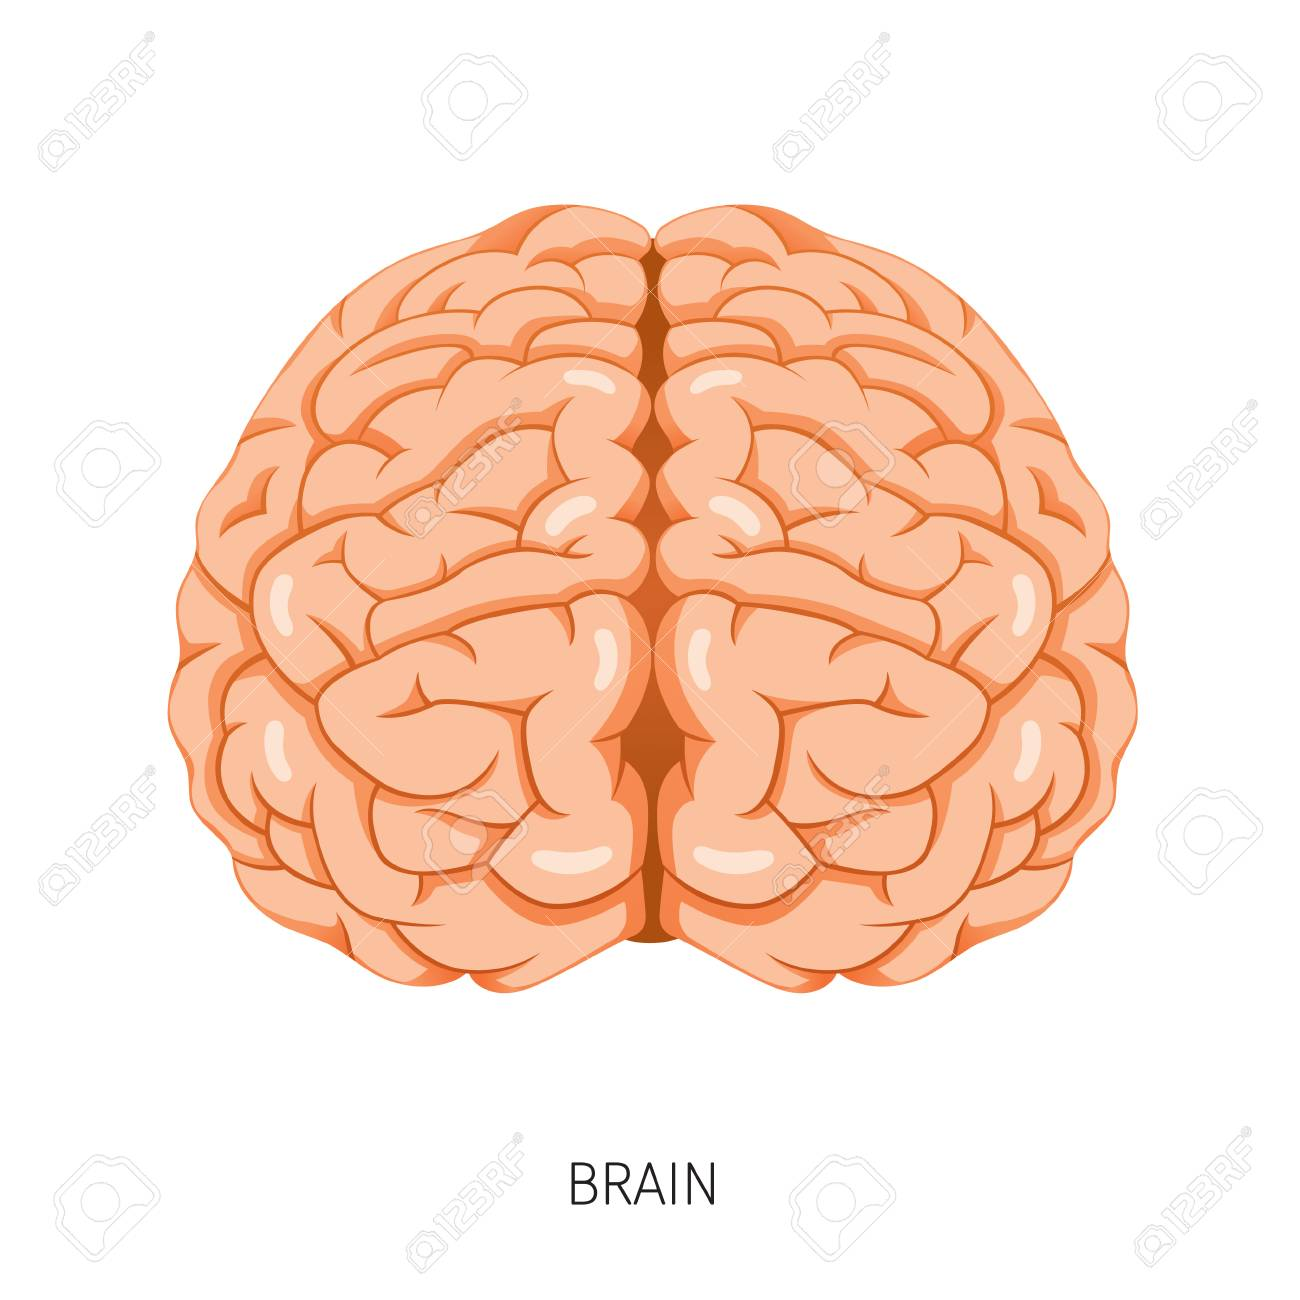 Brain Human Internal Organ Diagram Physiology Structure Medical